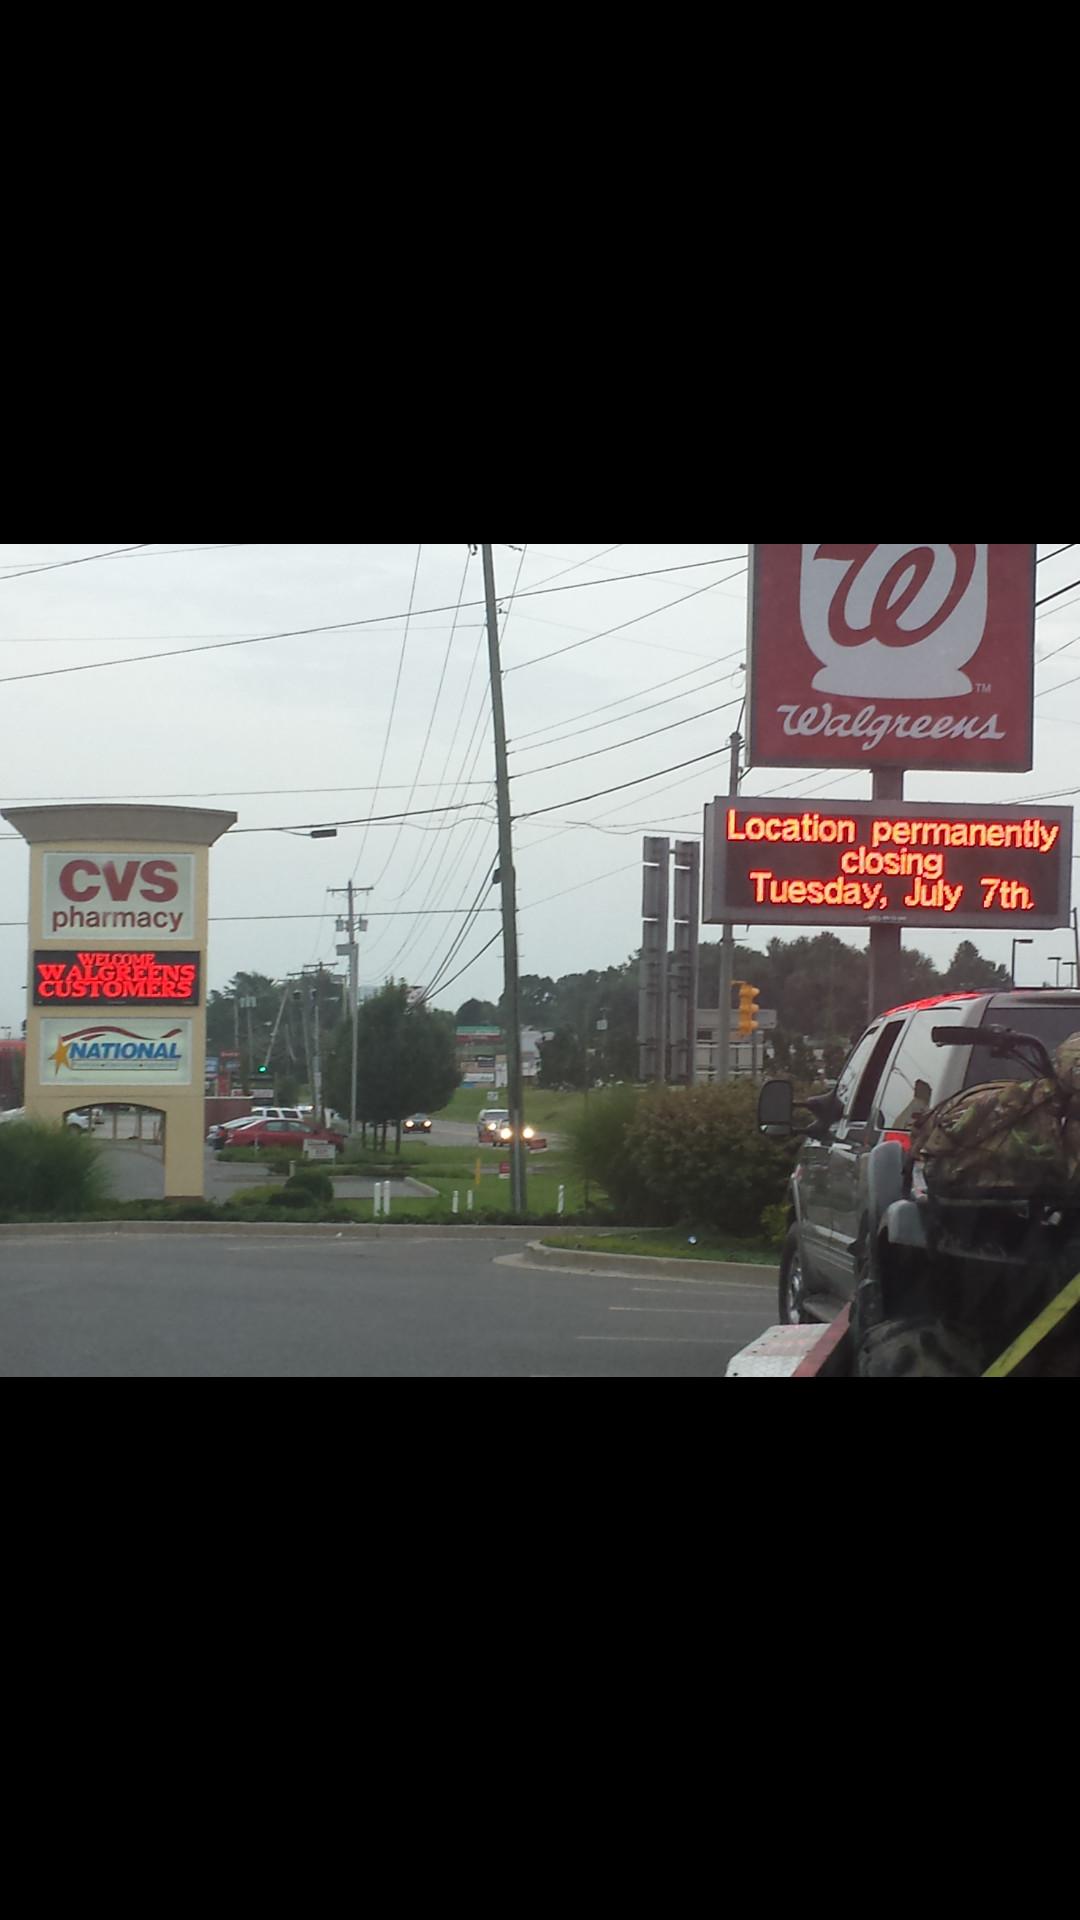 CVS welcomes Walgreens customers - meme